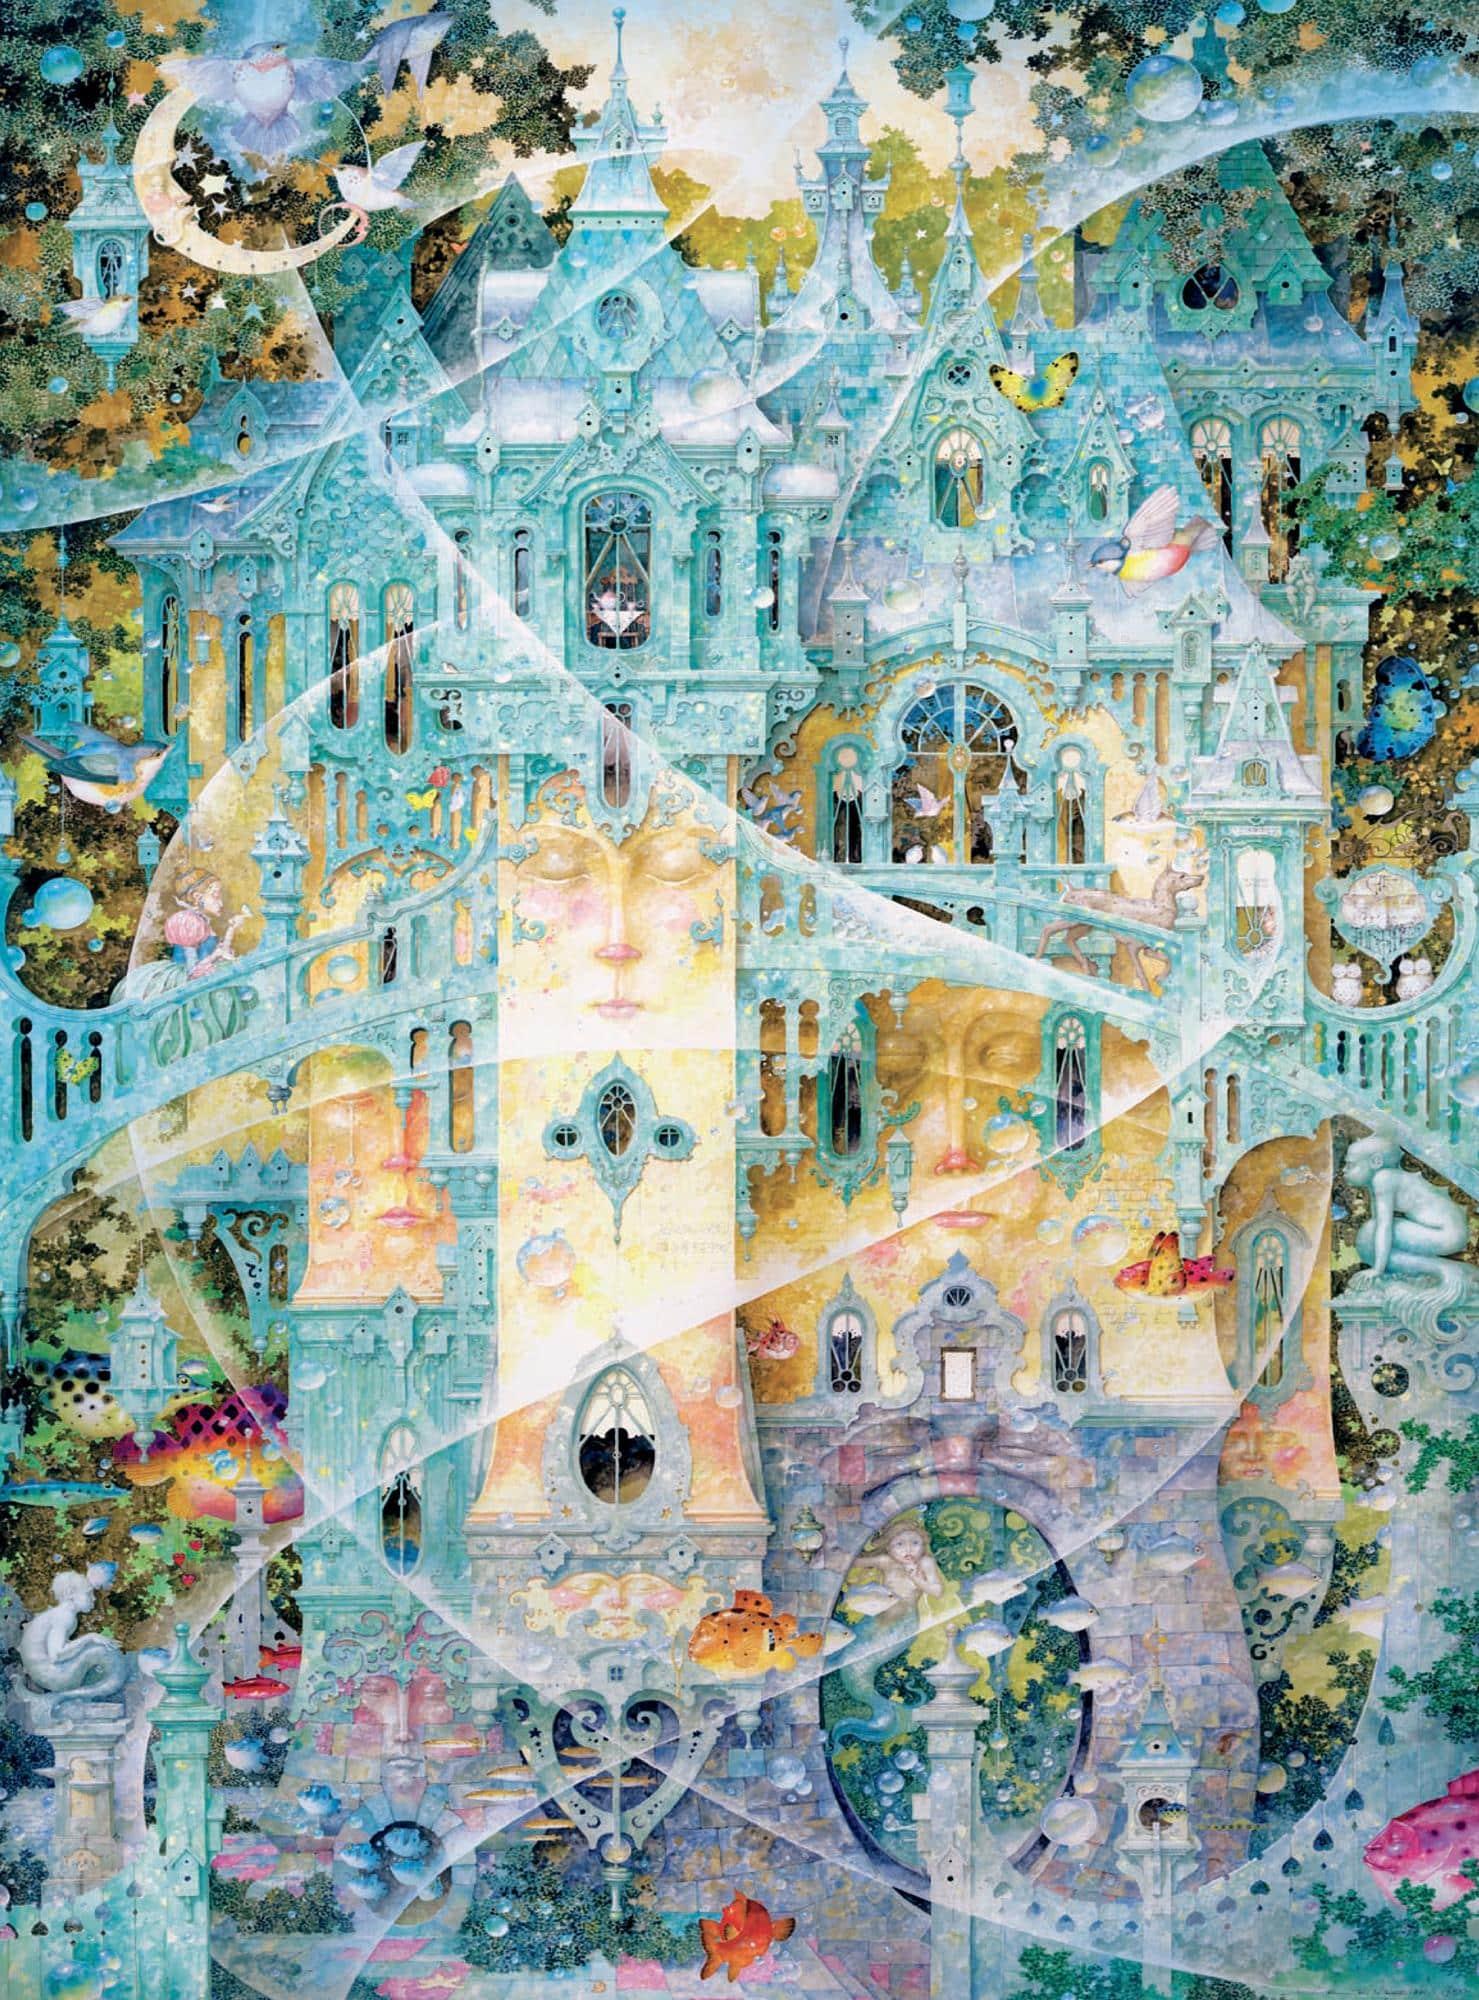 Daniel Merriam Pop Surrealism